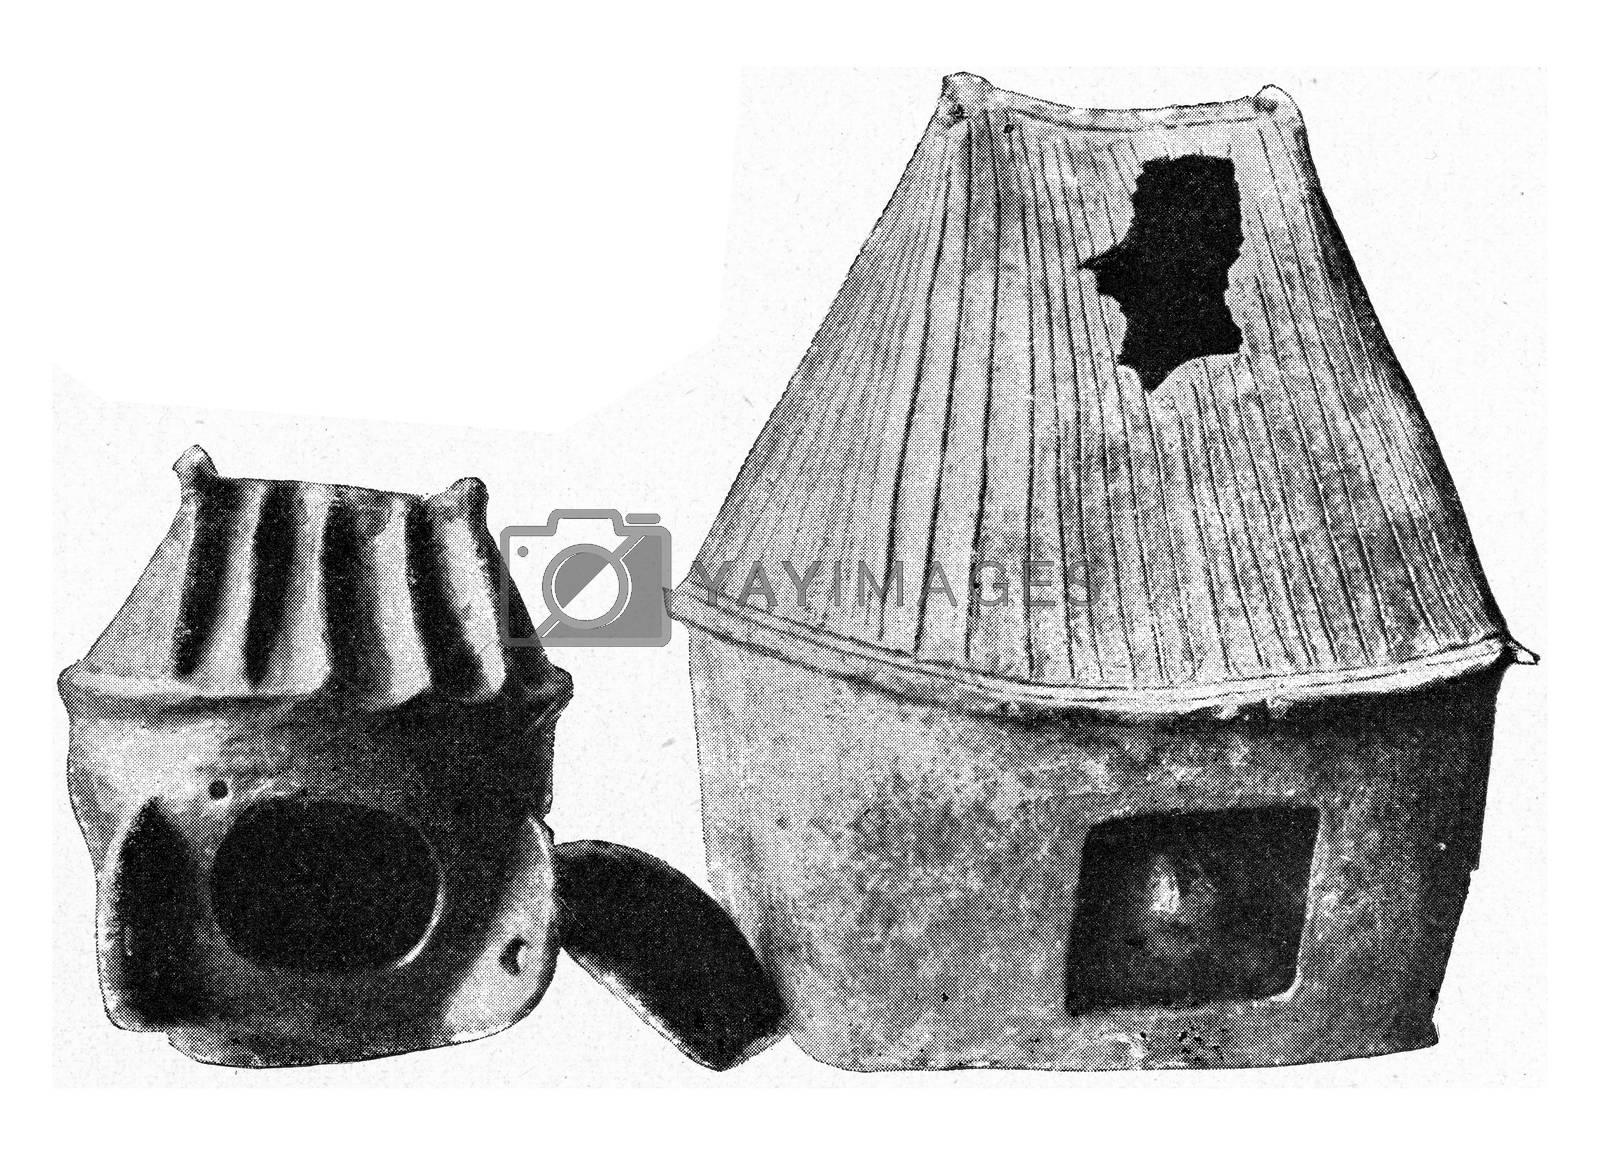 Family urns from Wilsleben and Aschersleben, vintage engraving. by Morphart